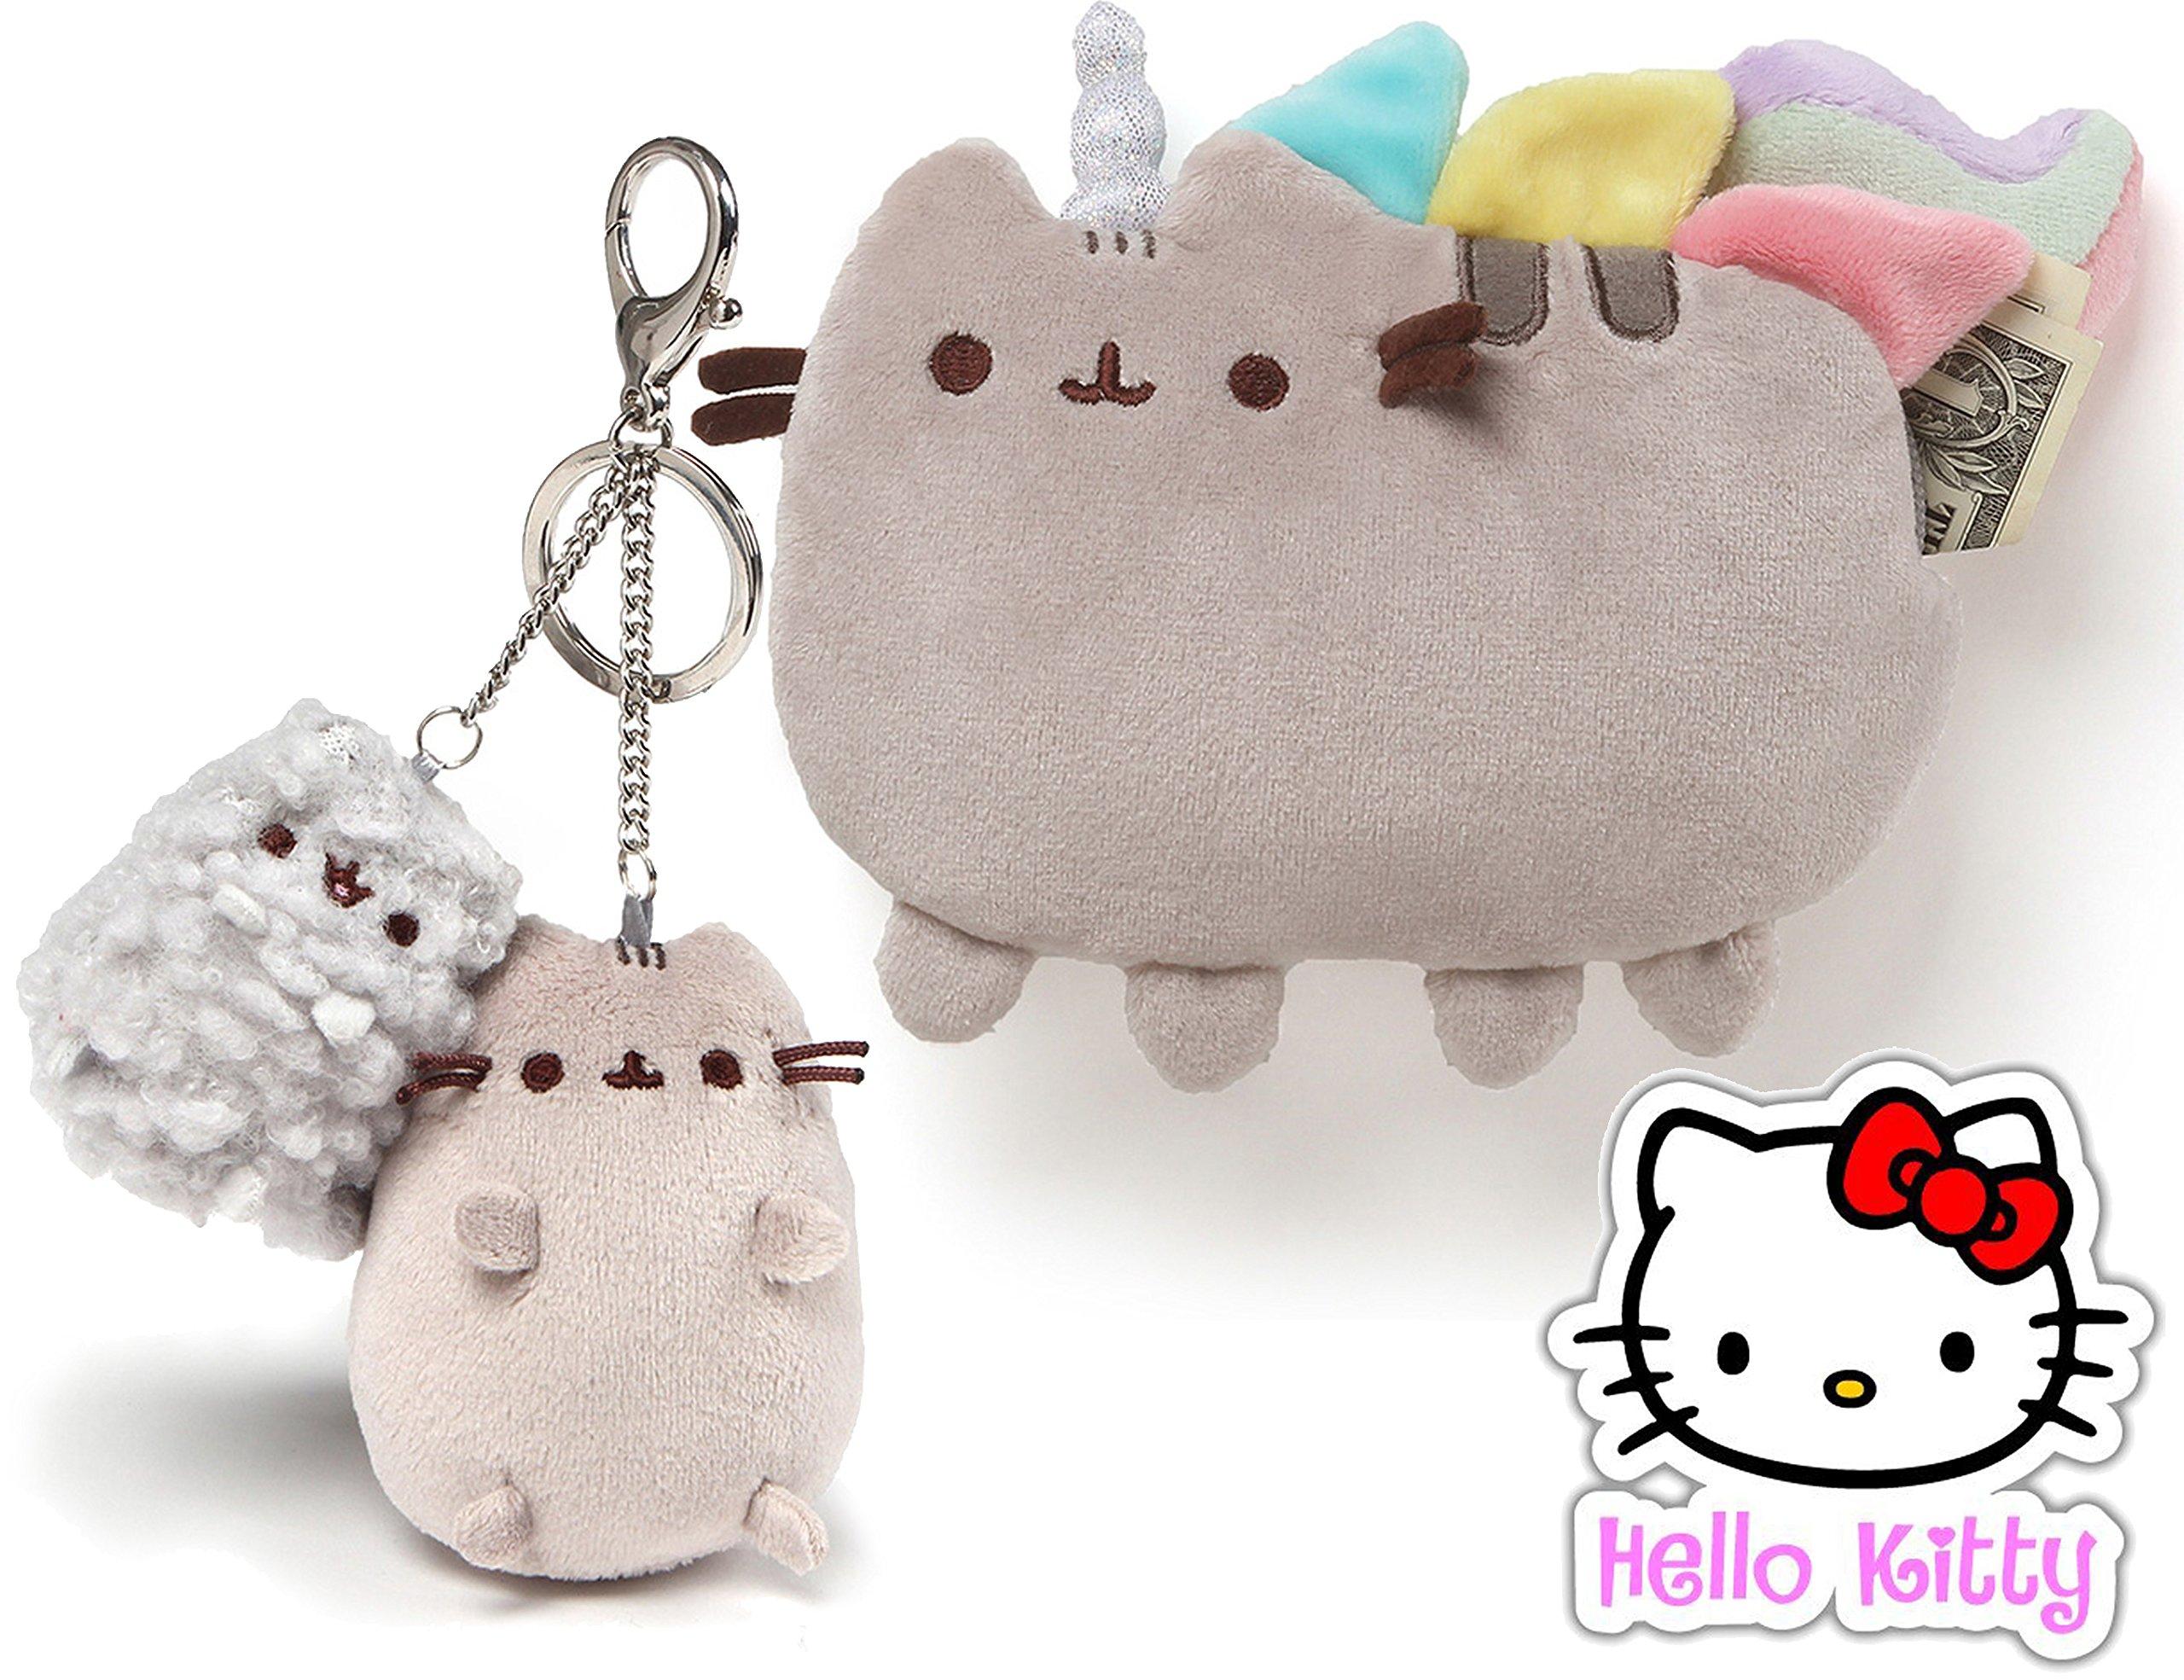 Gund Pusheen the Cat Pusheenicorn Coin 7'' Purse and Mini Pusheen / Stormy 4.5'' Keychain Clip Set of 2 Plush Toys with Hello Kitty Sticker by Pusheen